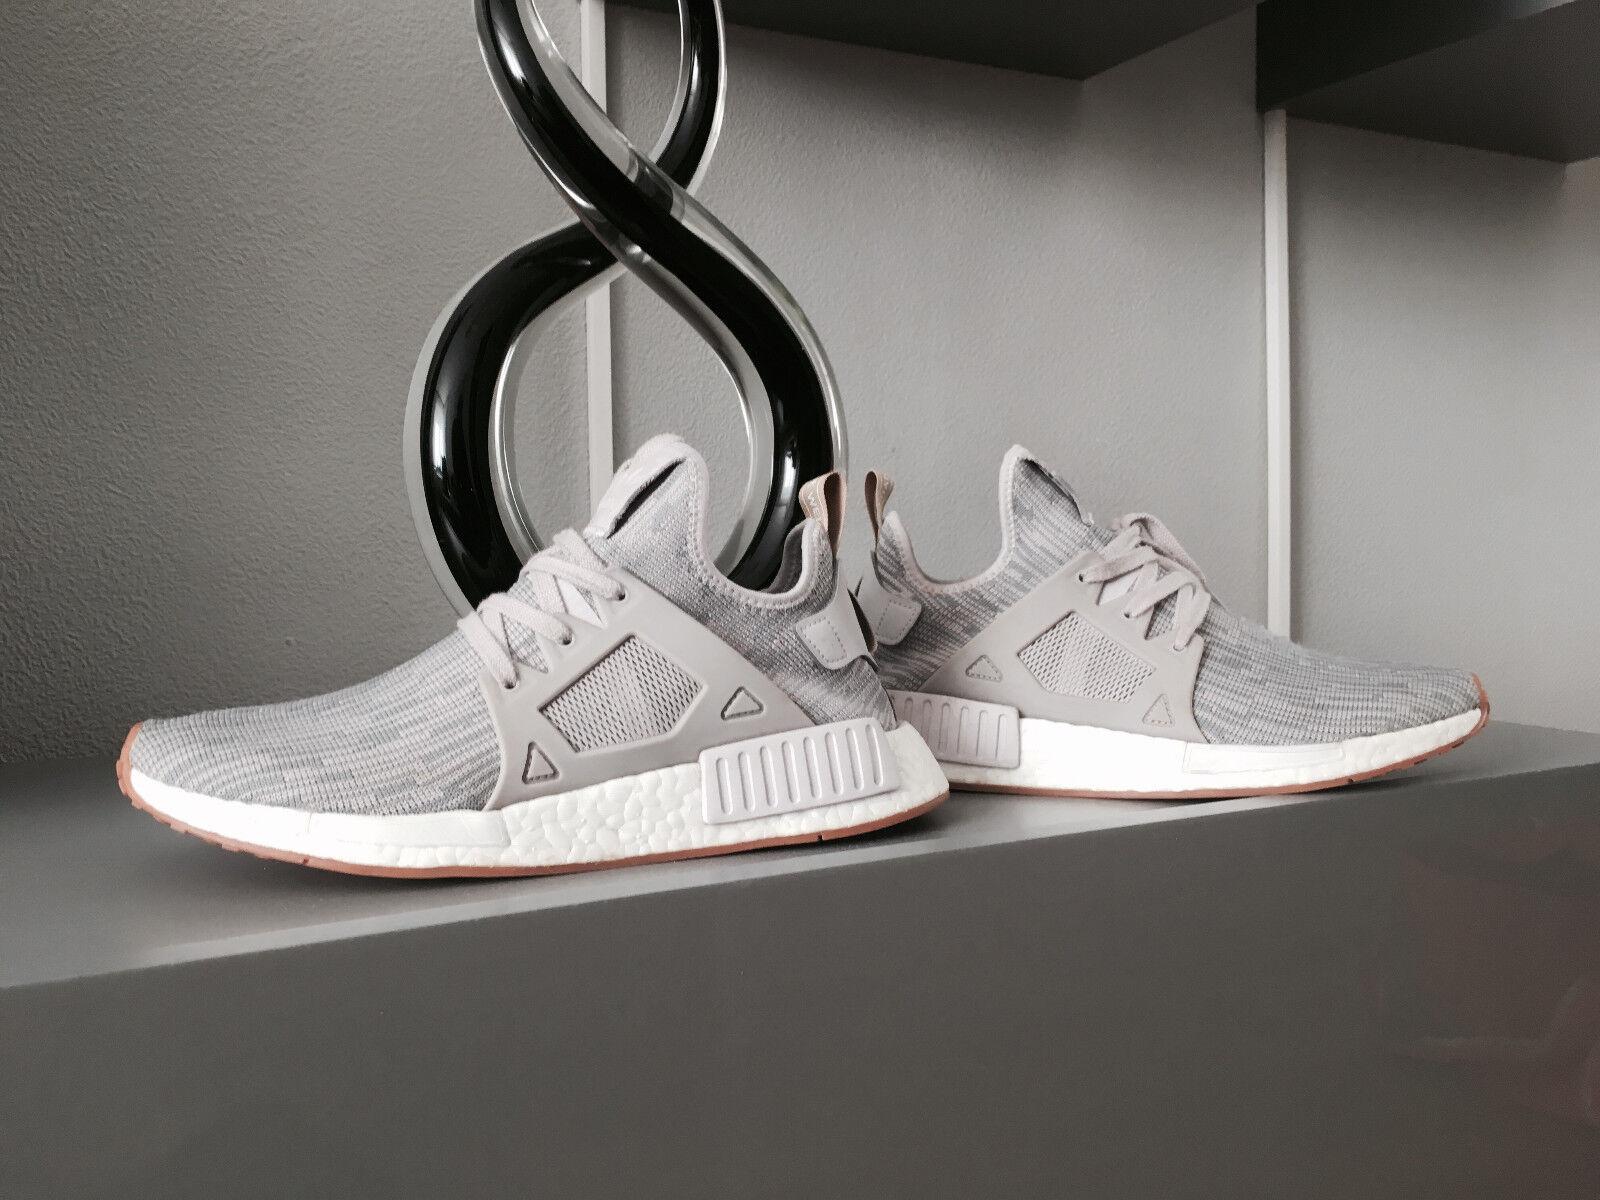 Adidas NMD Herrenschuh Gr.41 1/3 - 42 Sneaker Gum Grau Weiß TOP ZUSTAND!